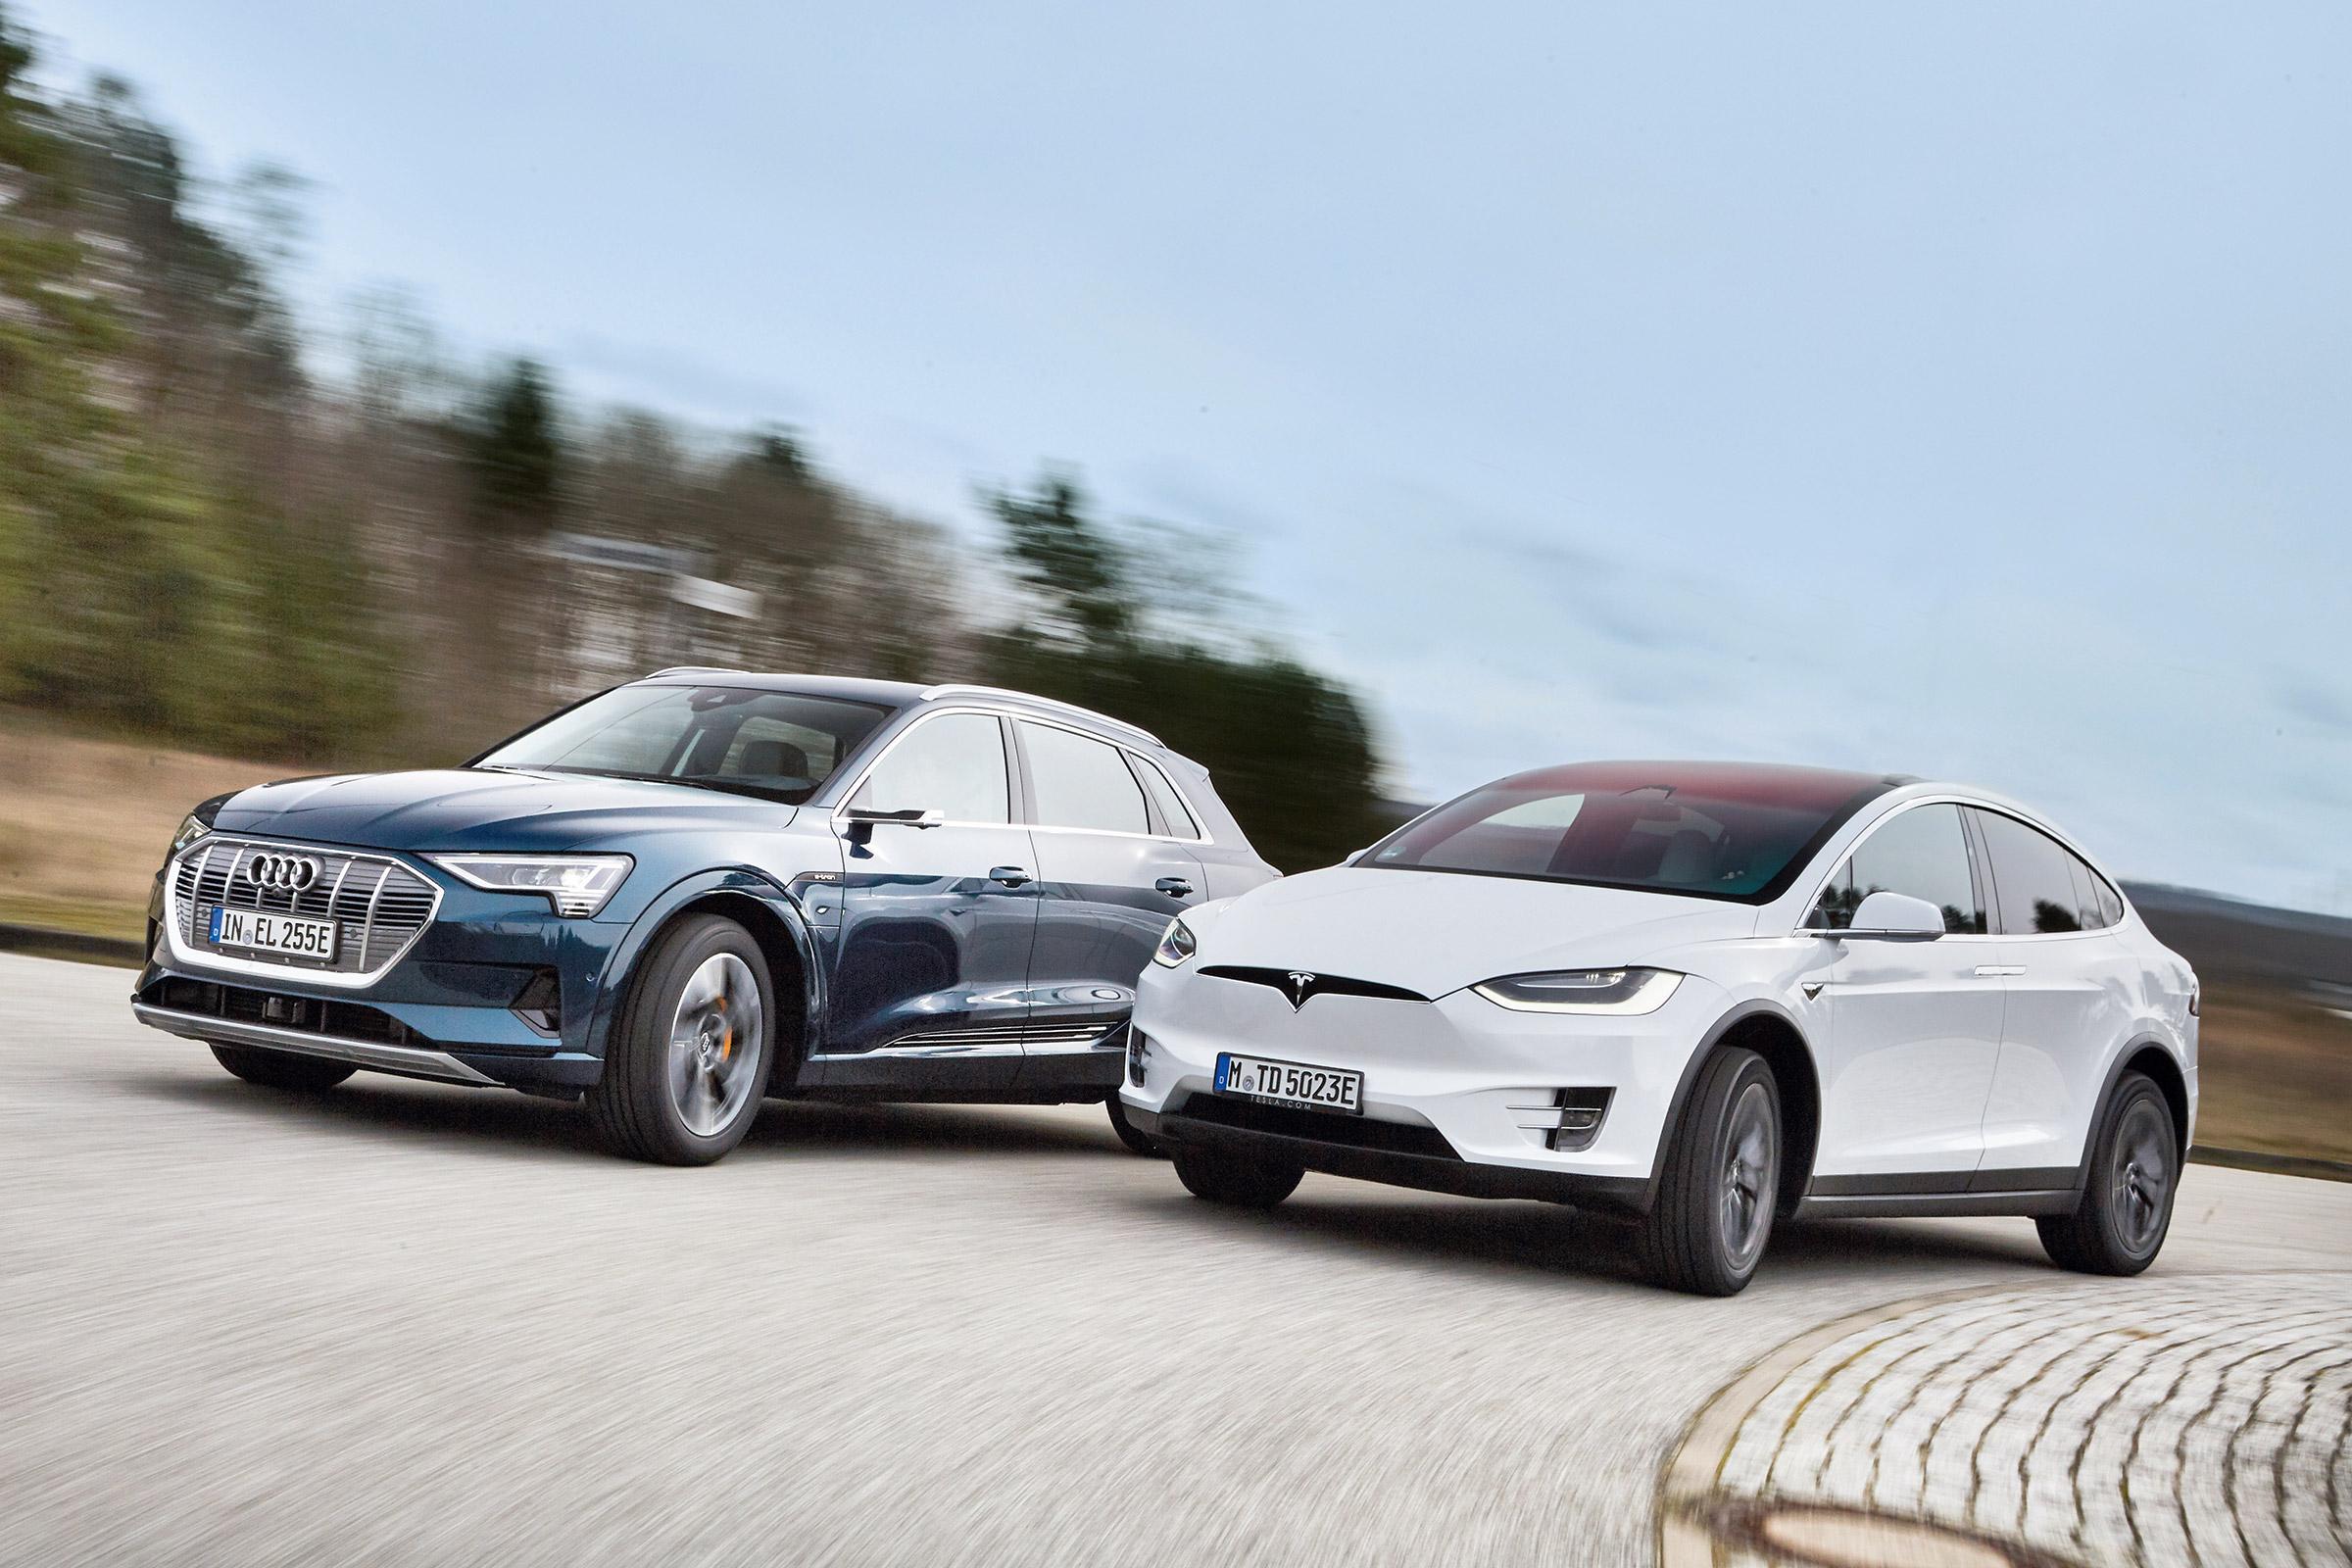 Audi E Tron Vs Tesla Model X Suvs Face Off In Electric Car Showdown Auto Express